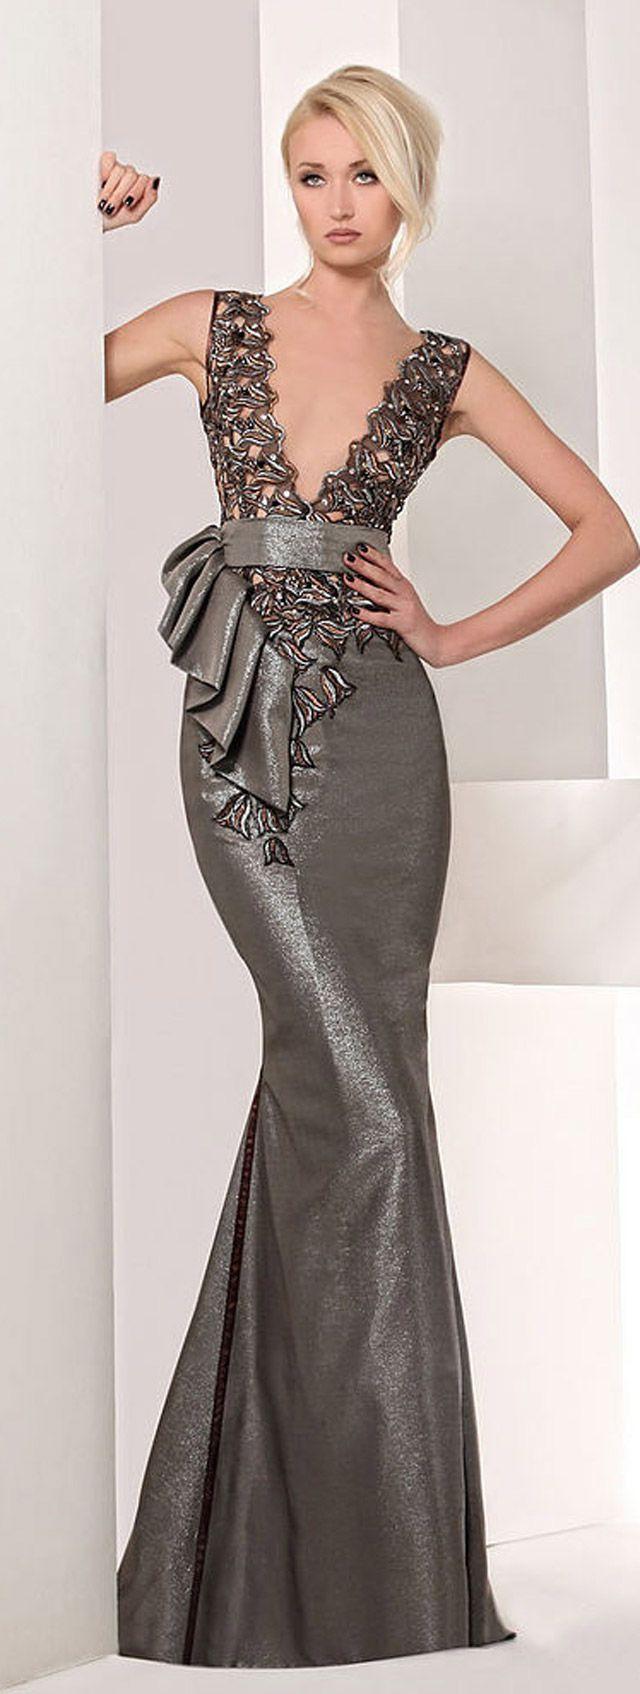 Fustana 2015 modele te fustanave 2015 dresses 2015 fustana modele te - Fustana 2015 Modele Te Fustanave 2015 Dresses 2015 Fustana Modele Te 0